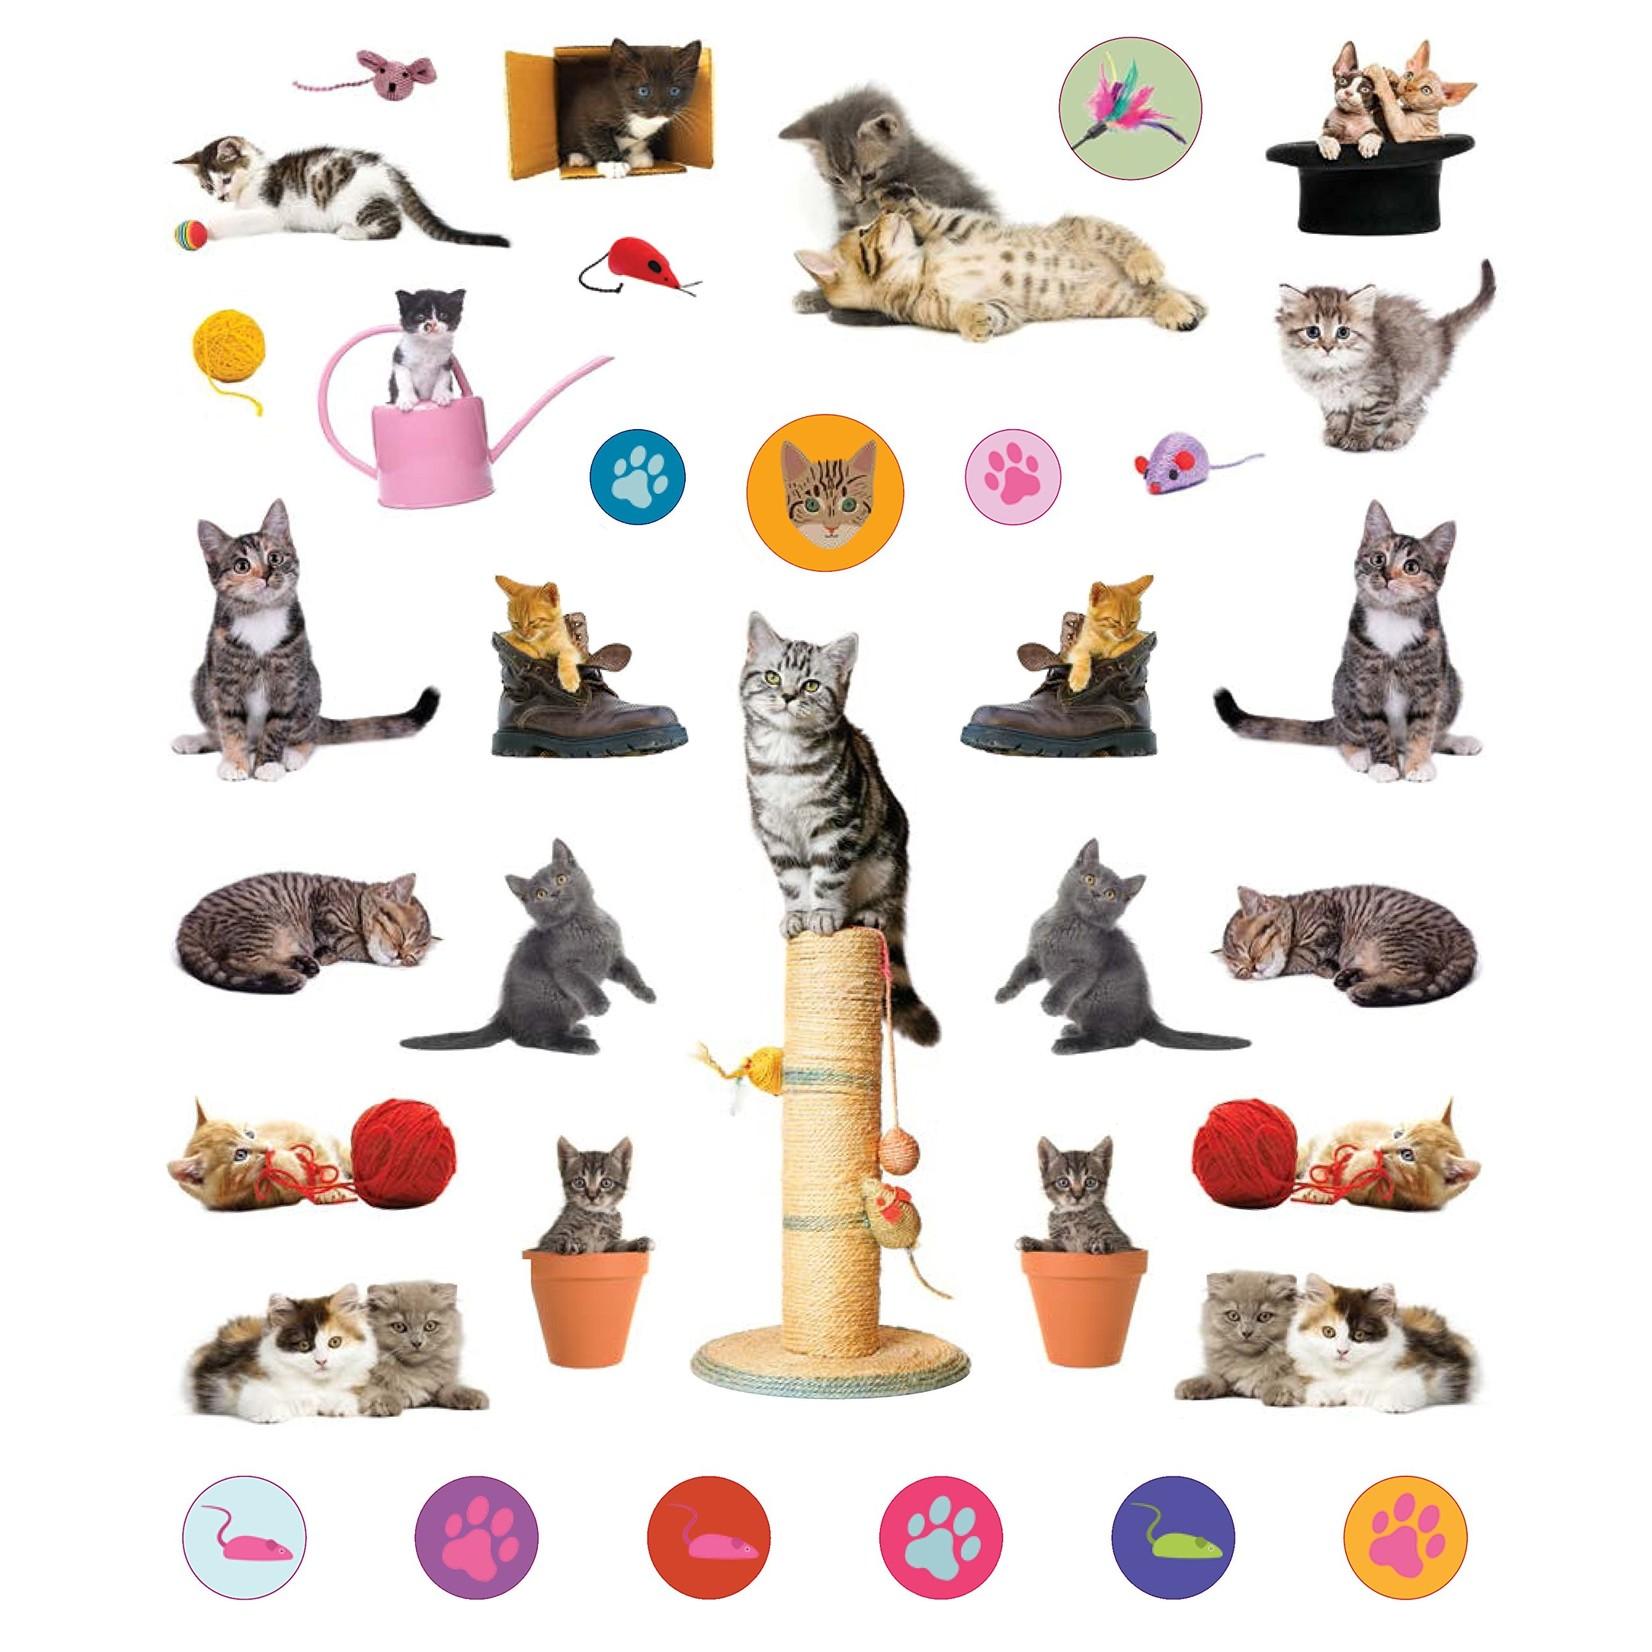 Kittens Reusable Stickers